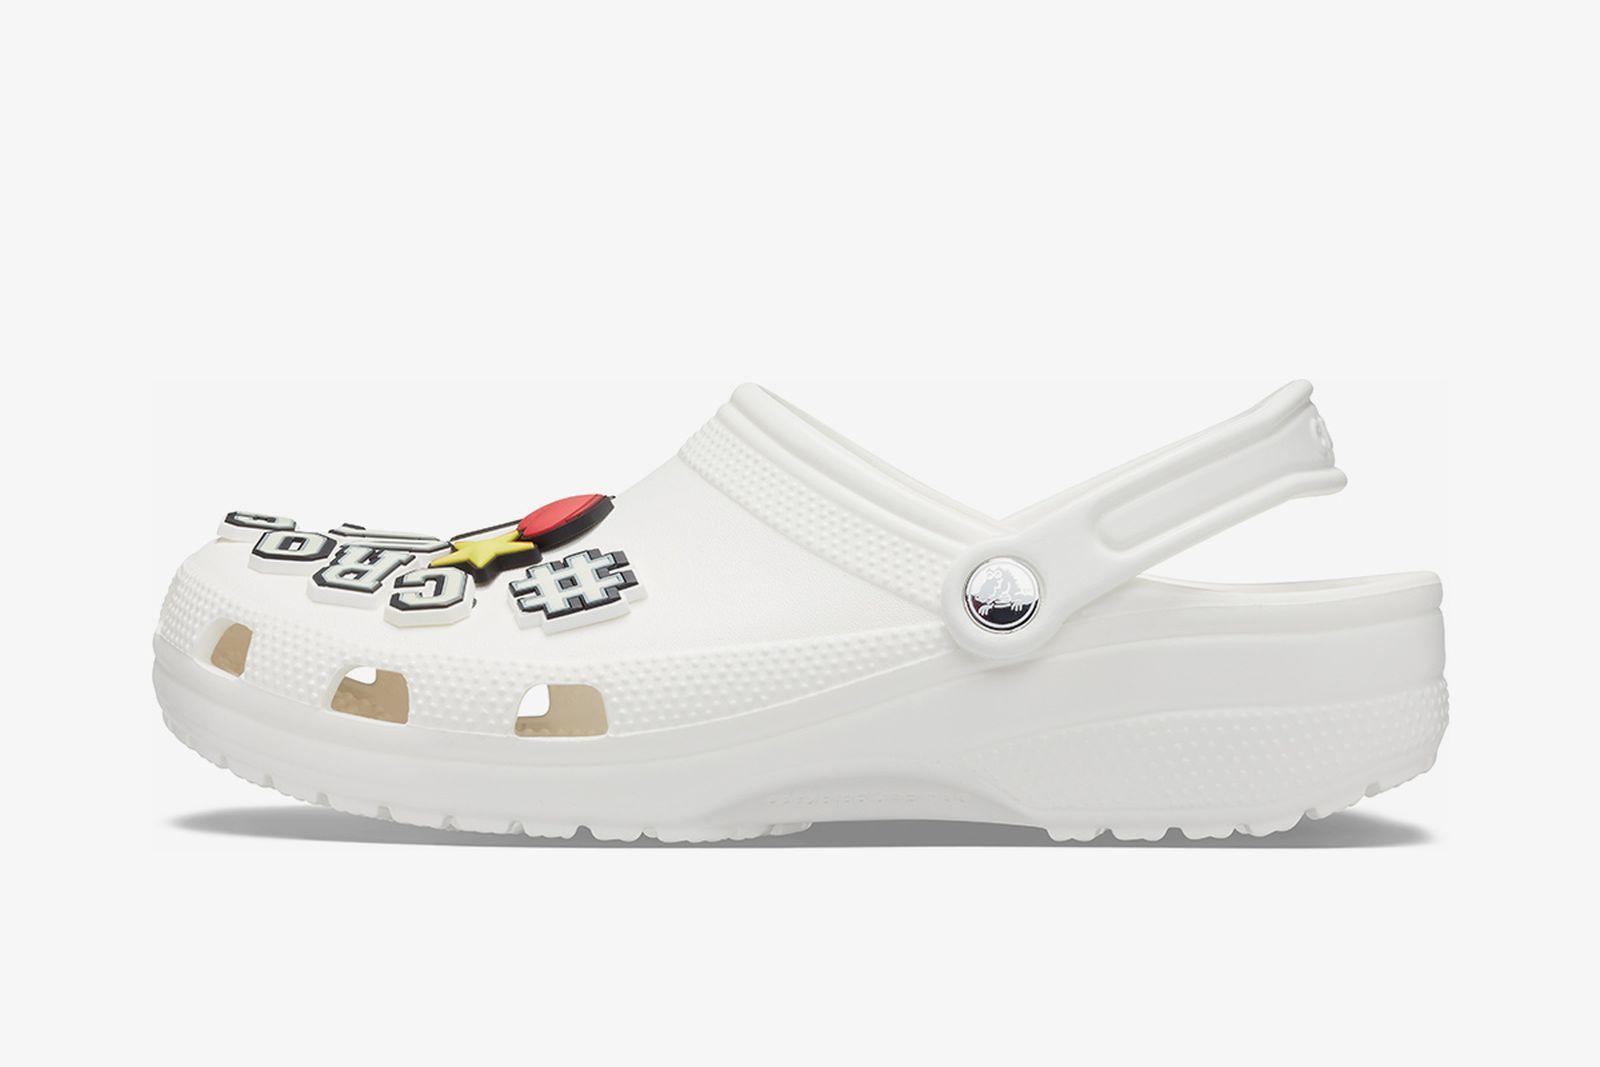 pizzaslime-crocs-classic-clog-release-date-price-05